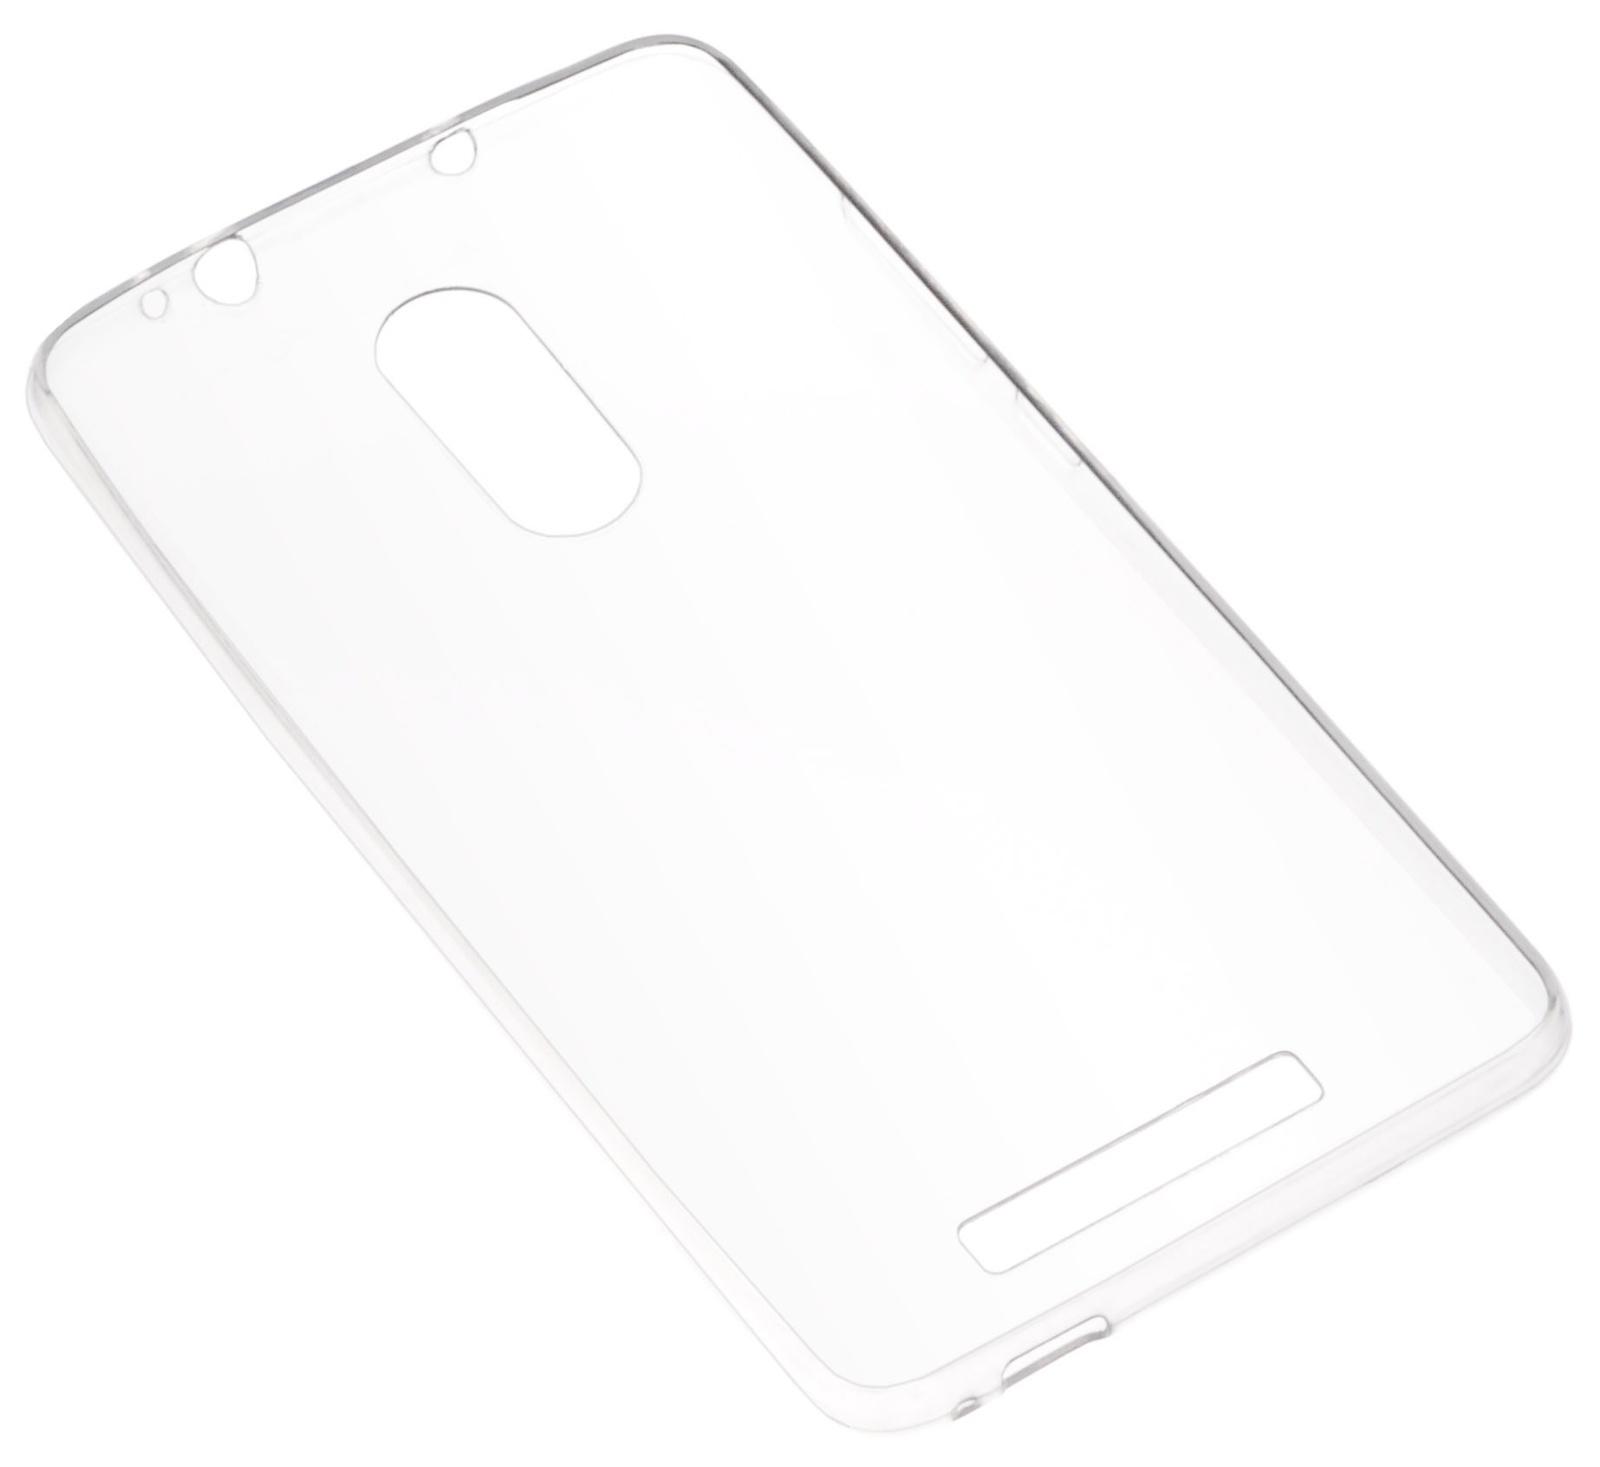 Чехол для сотового телефона skinBOX Slim Silicone, 4660041407624, прозрачный цена и фото